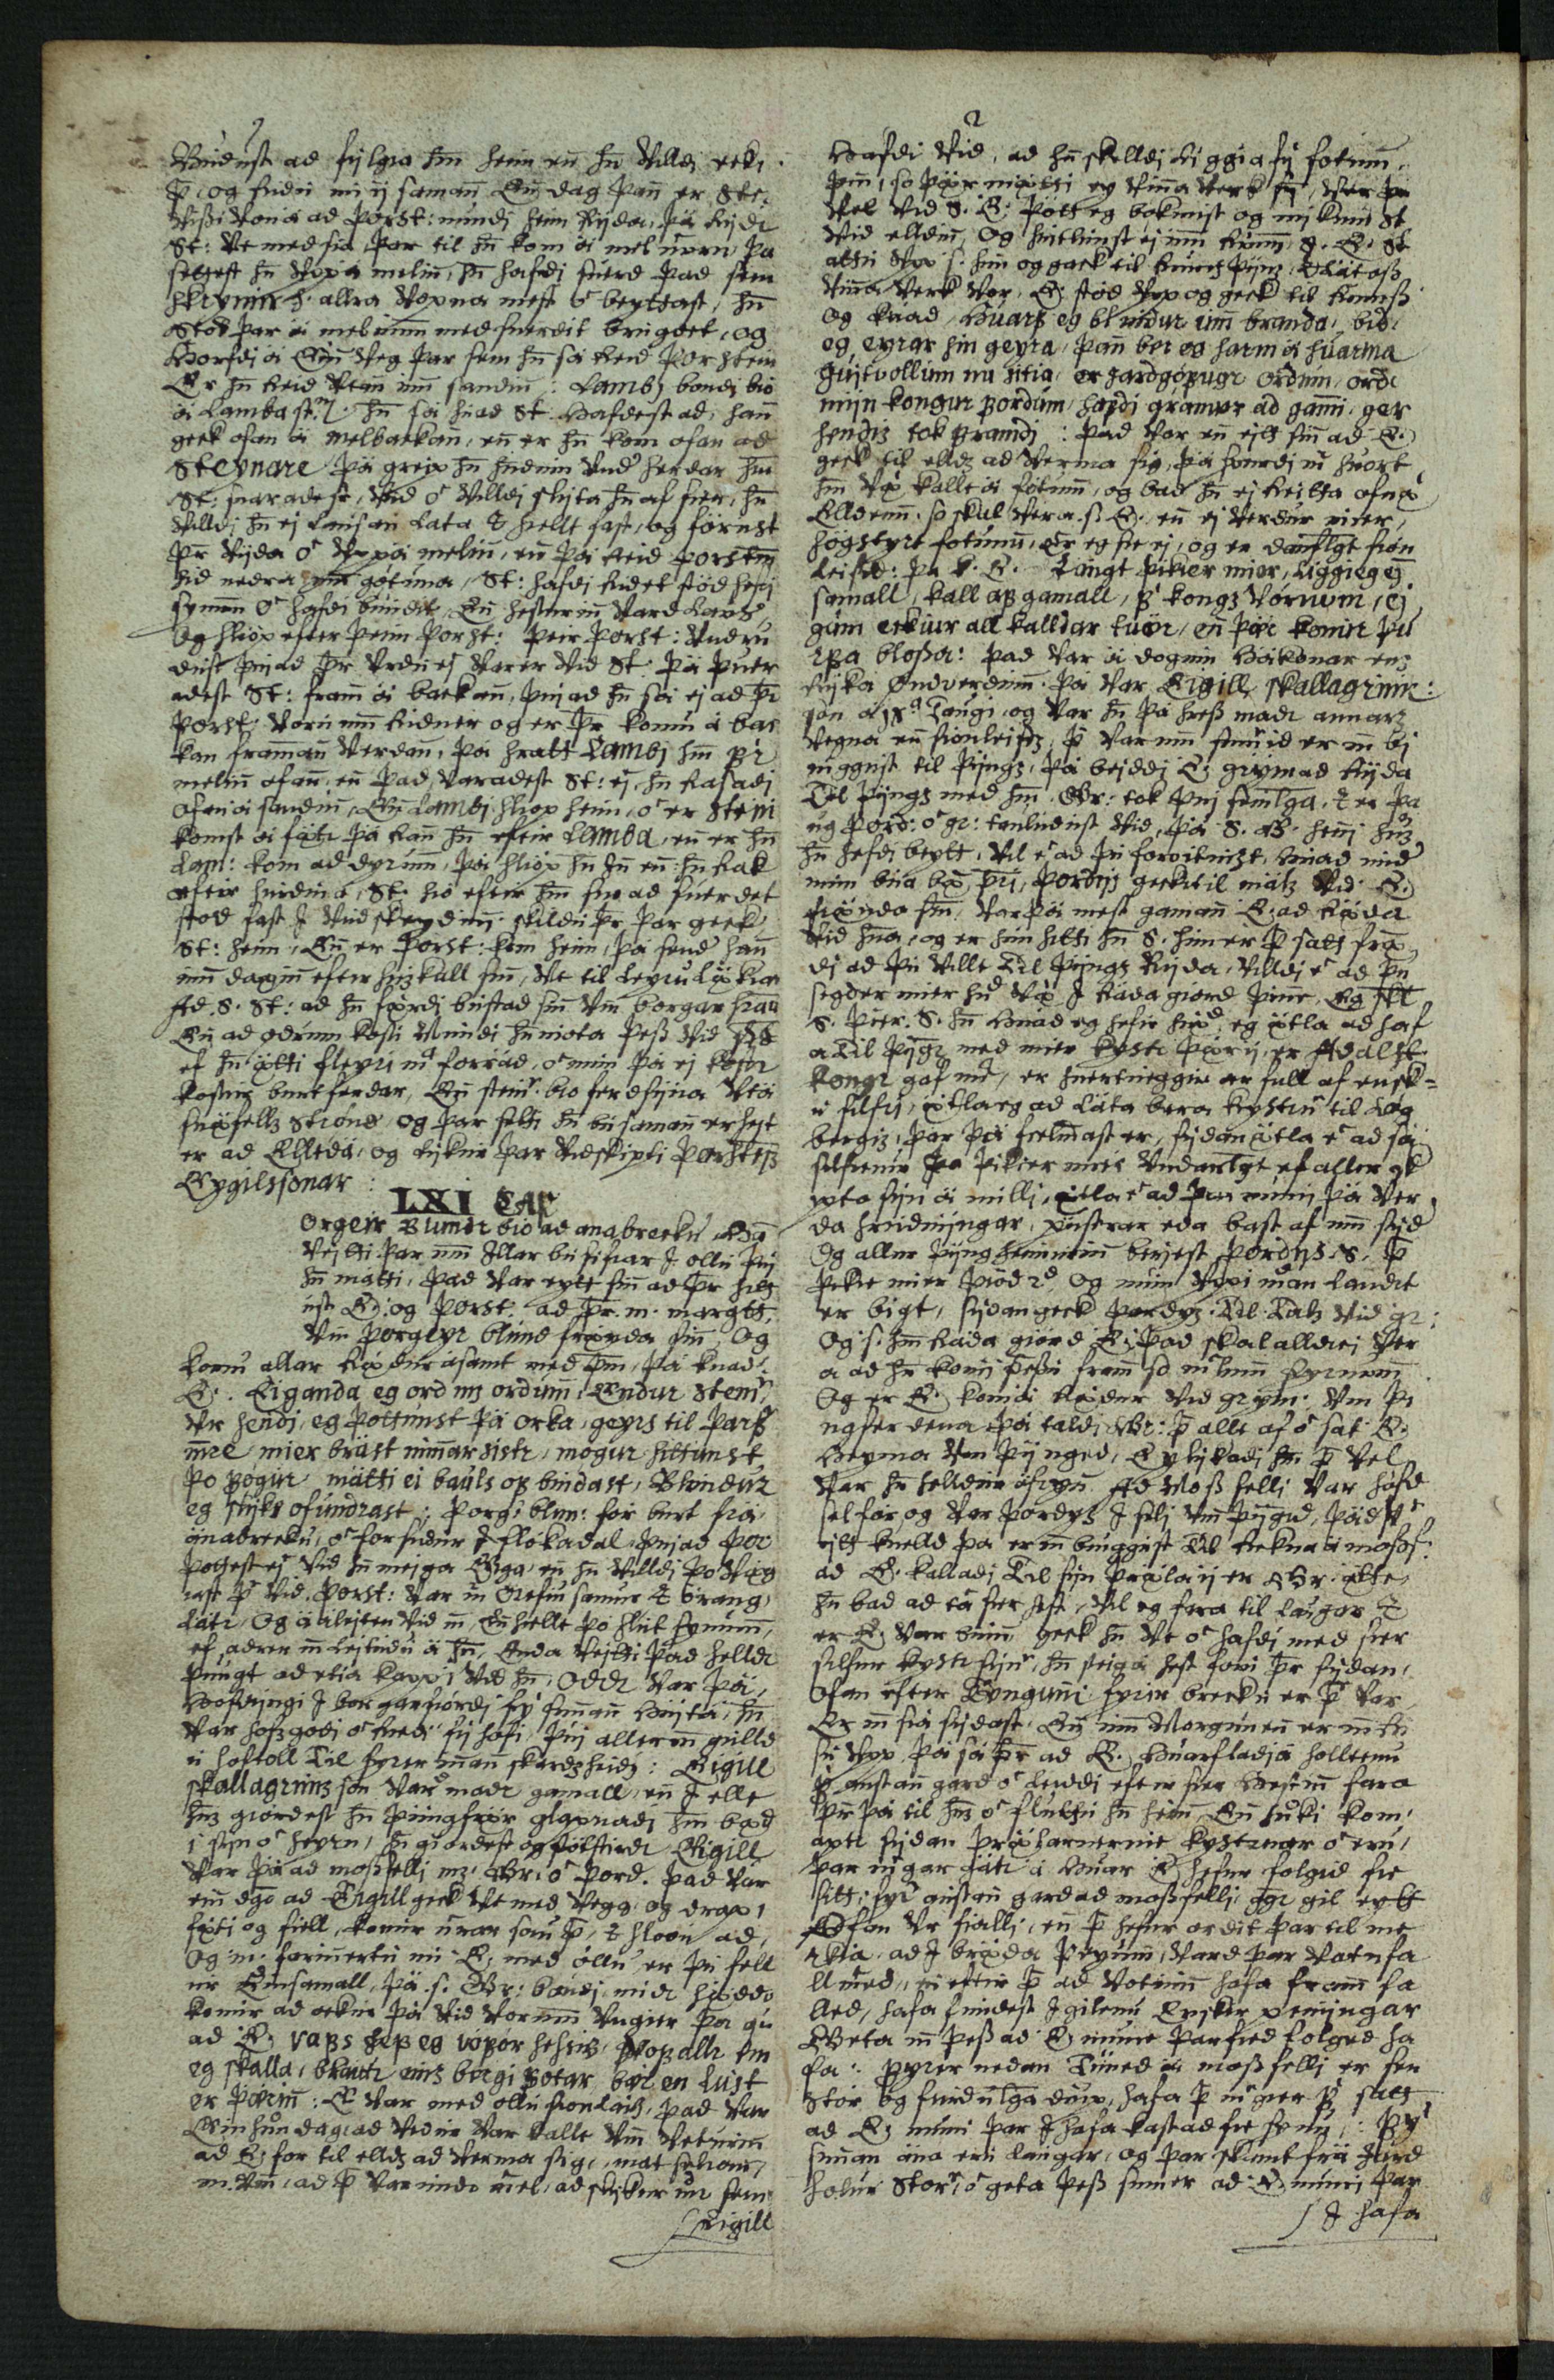 AM 158 fol - 93v